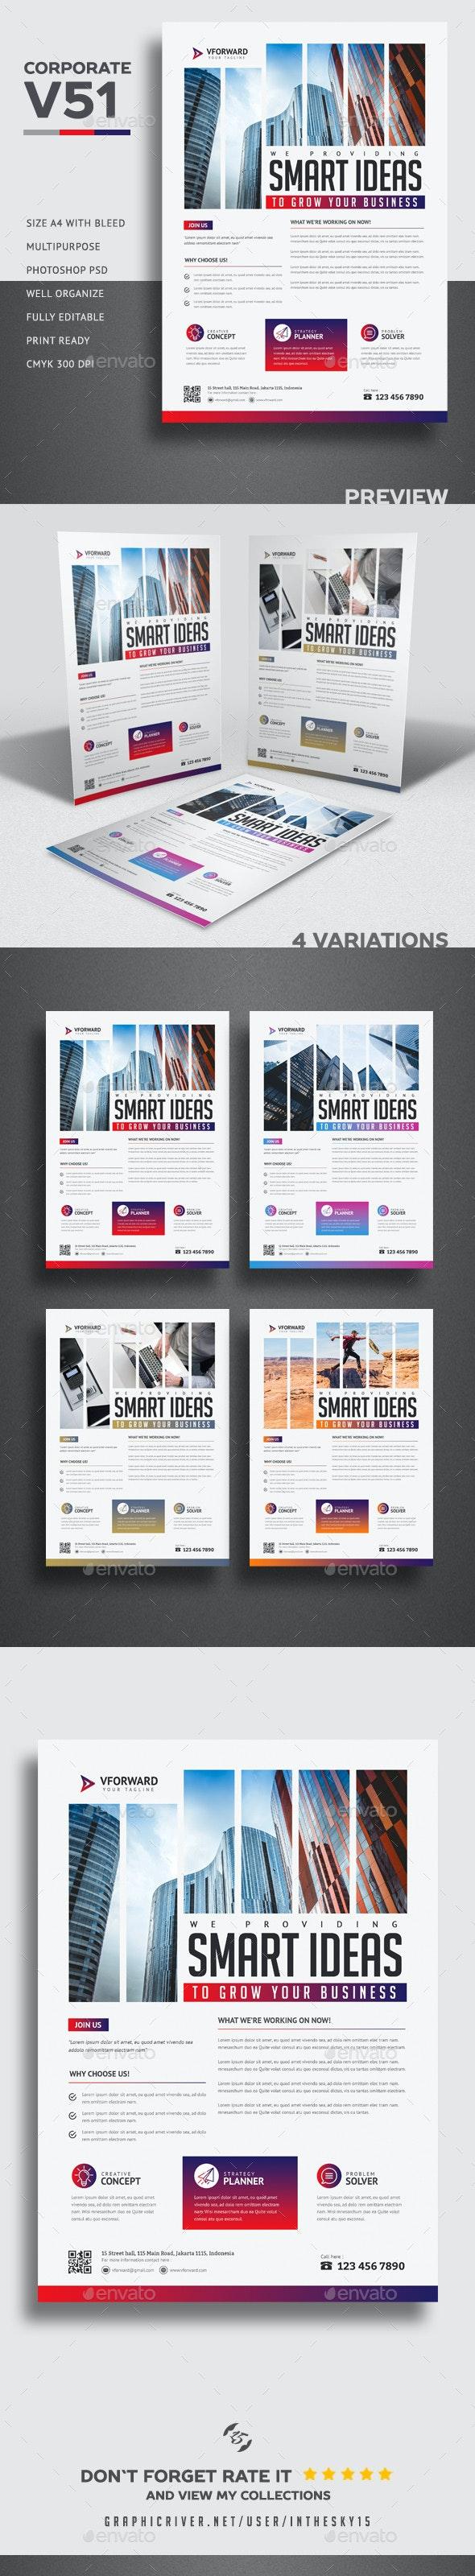 Corporate V51 Flyer - Corporate Brochures